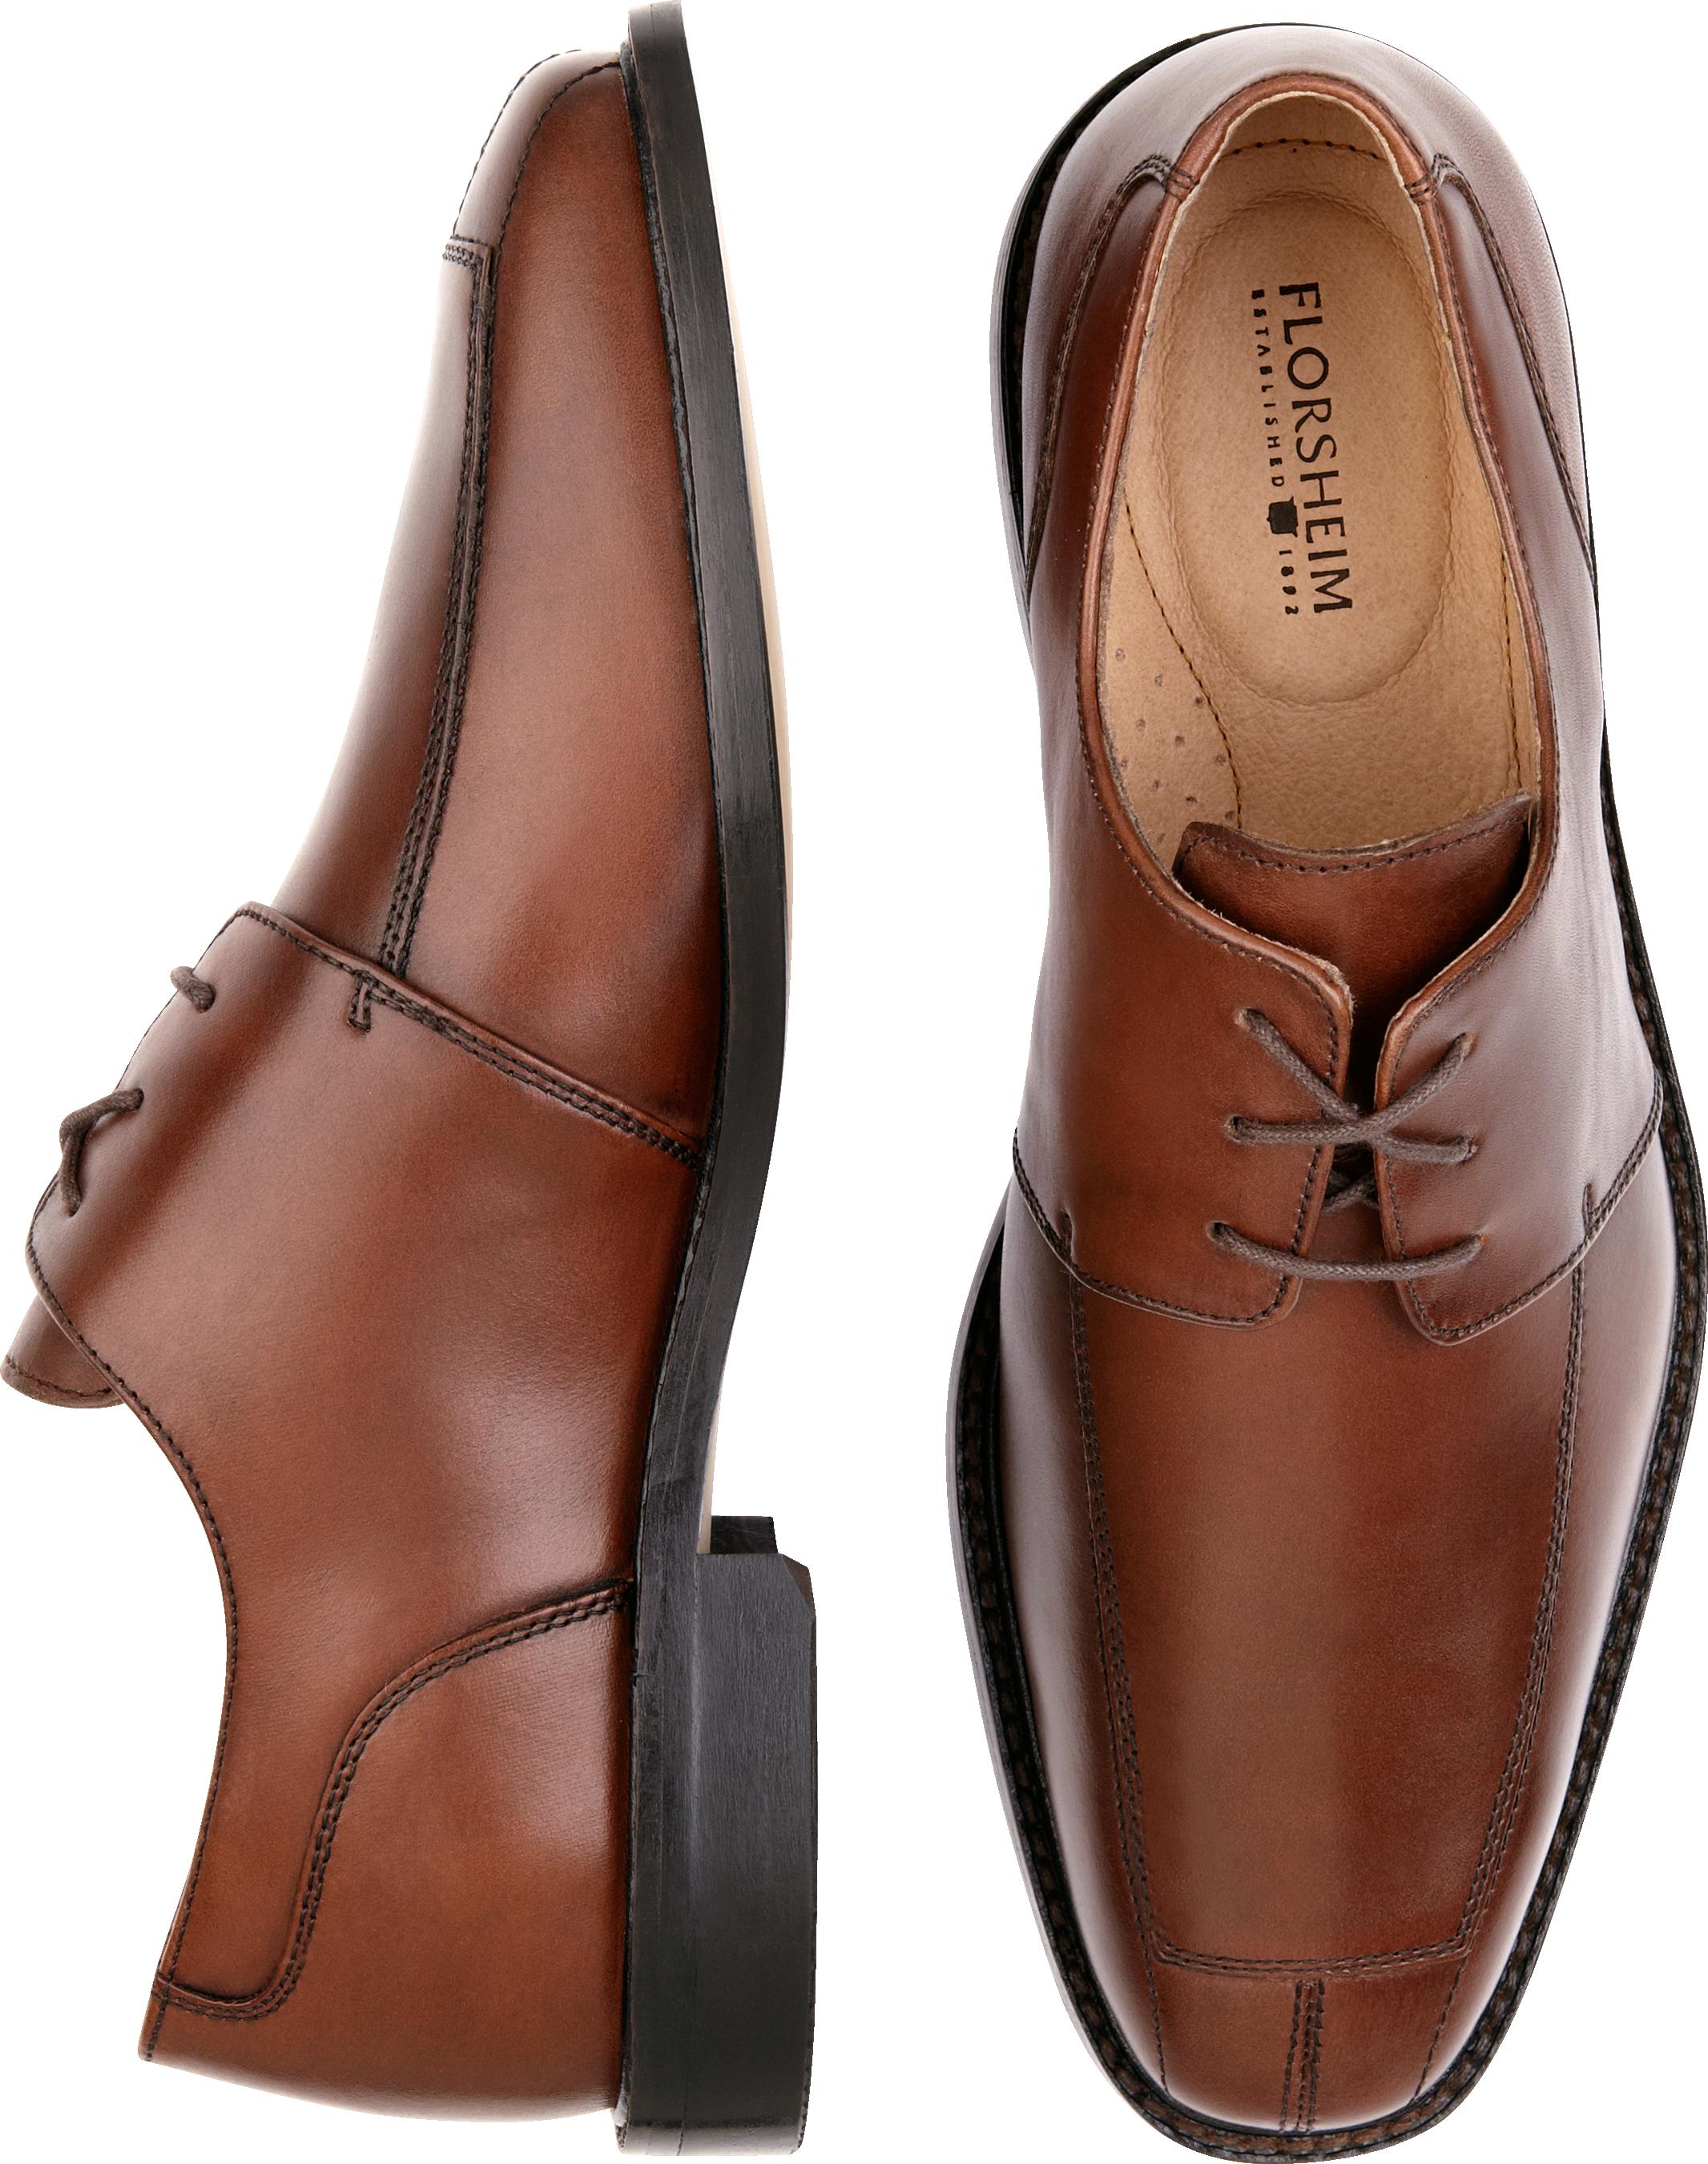 Cole Haan Men's 11 M Camel Tan Suede Wingtip Oxford Casual Dress Shoes